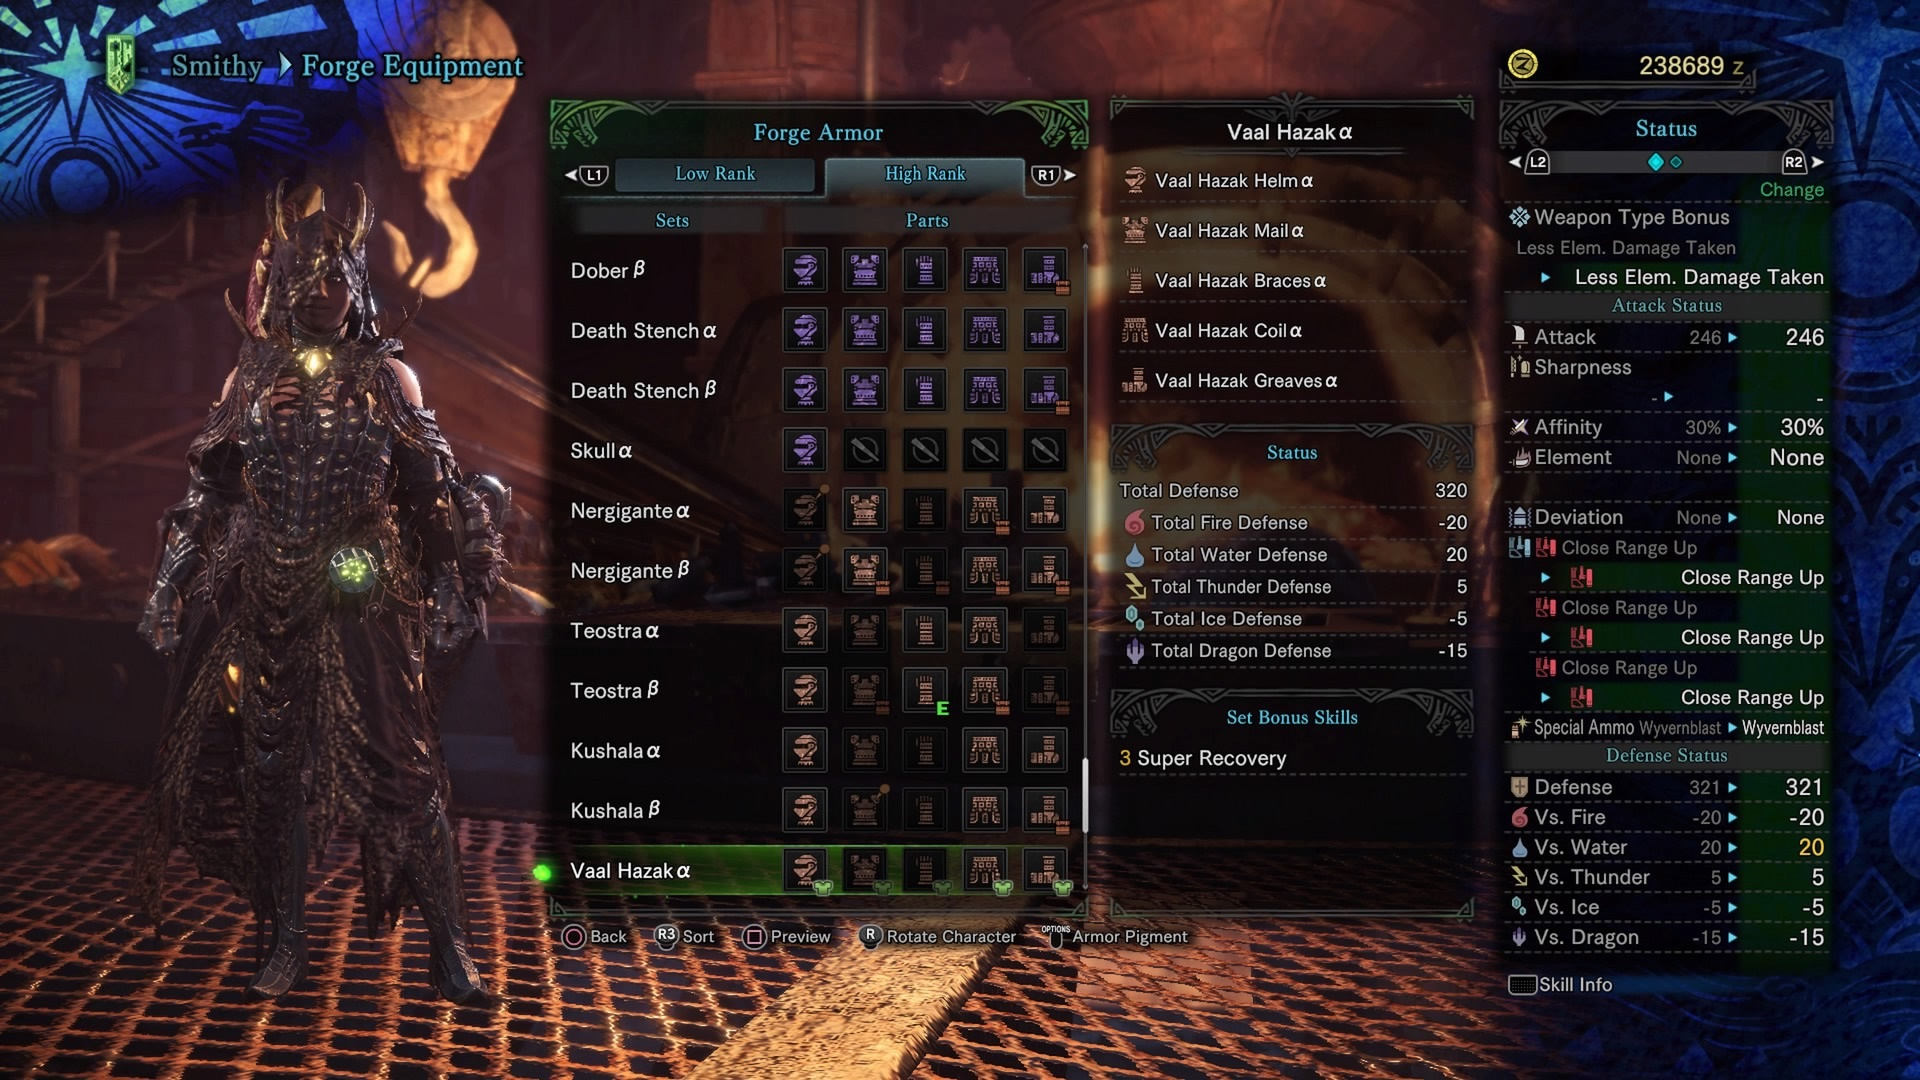 Monster Hunter: World armour guide – the 7 best sets | PCGamesN